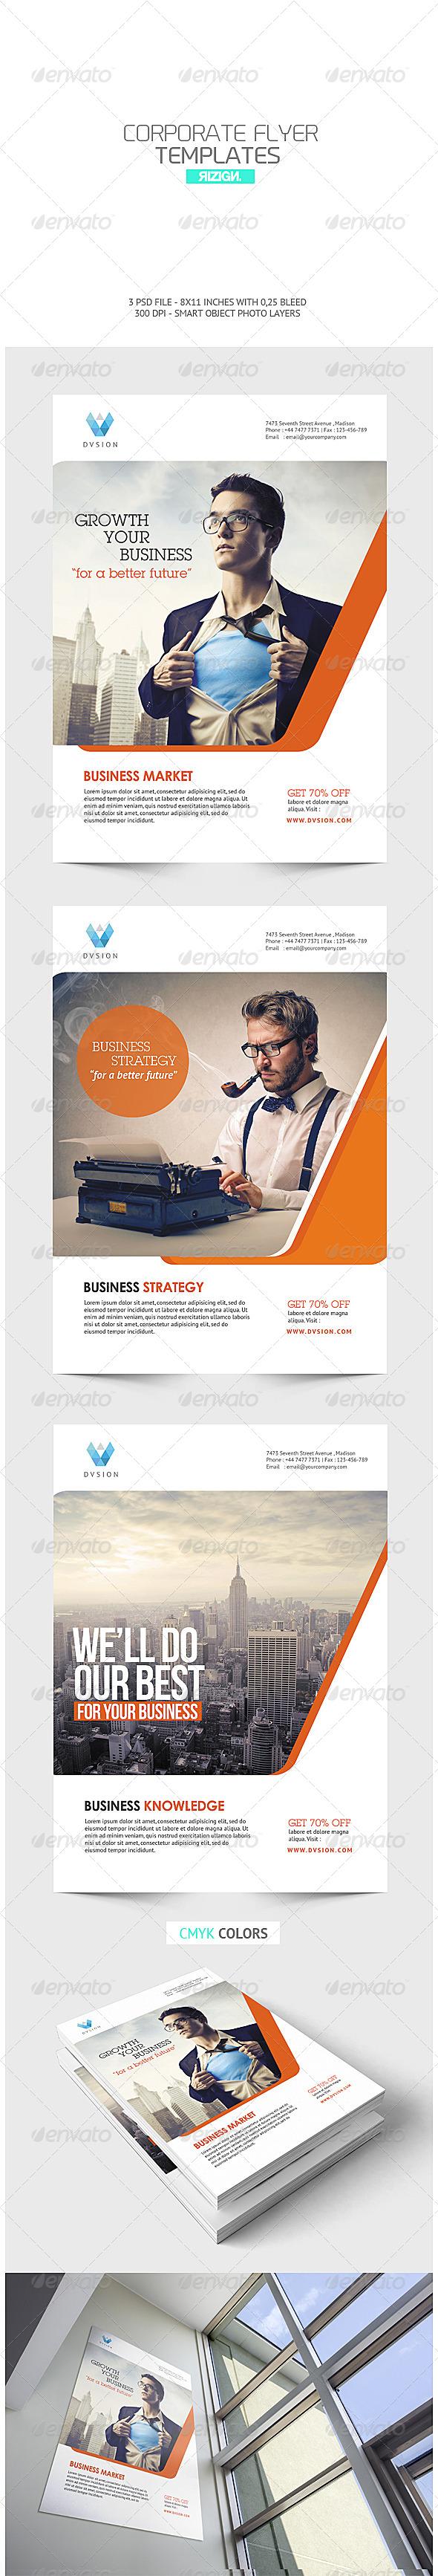 GraphicRiver Corporate Flyer 6792426